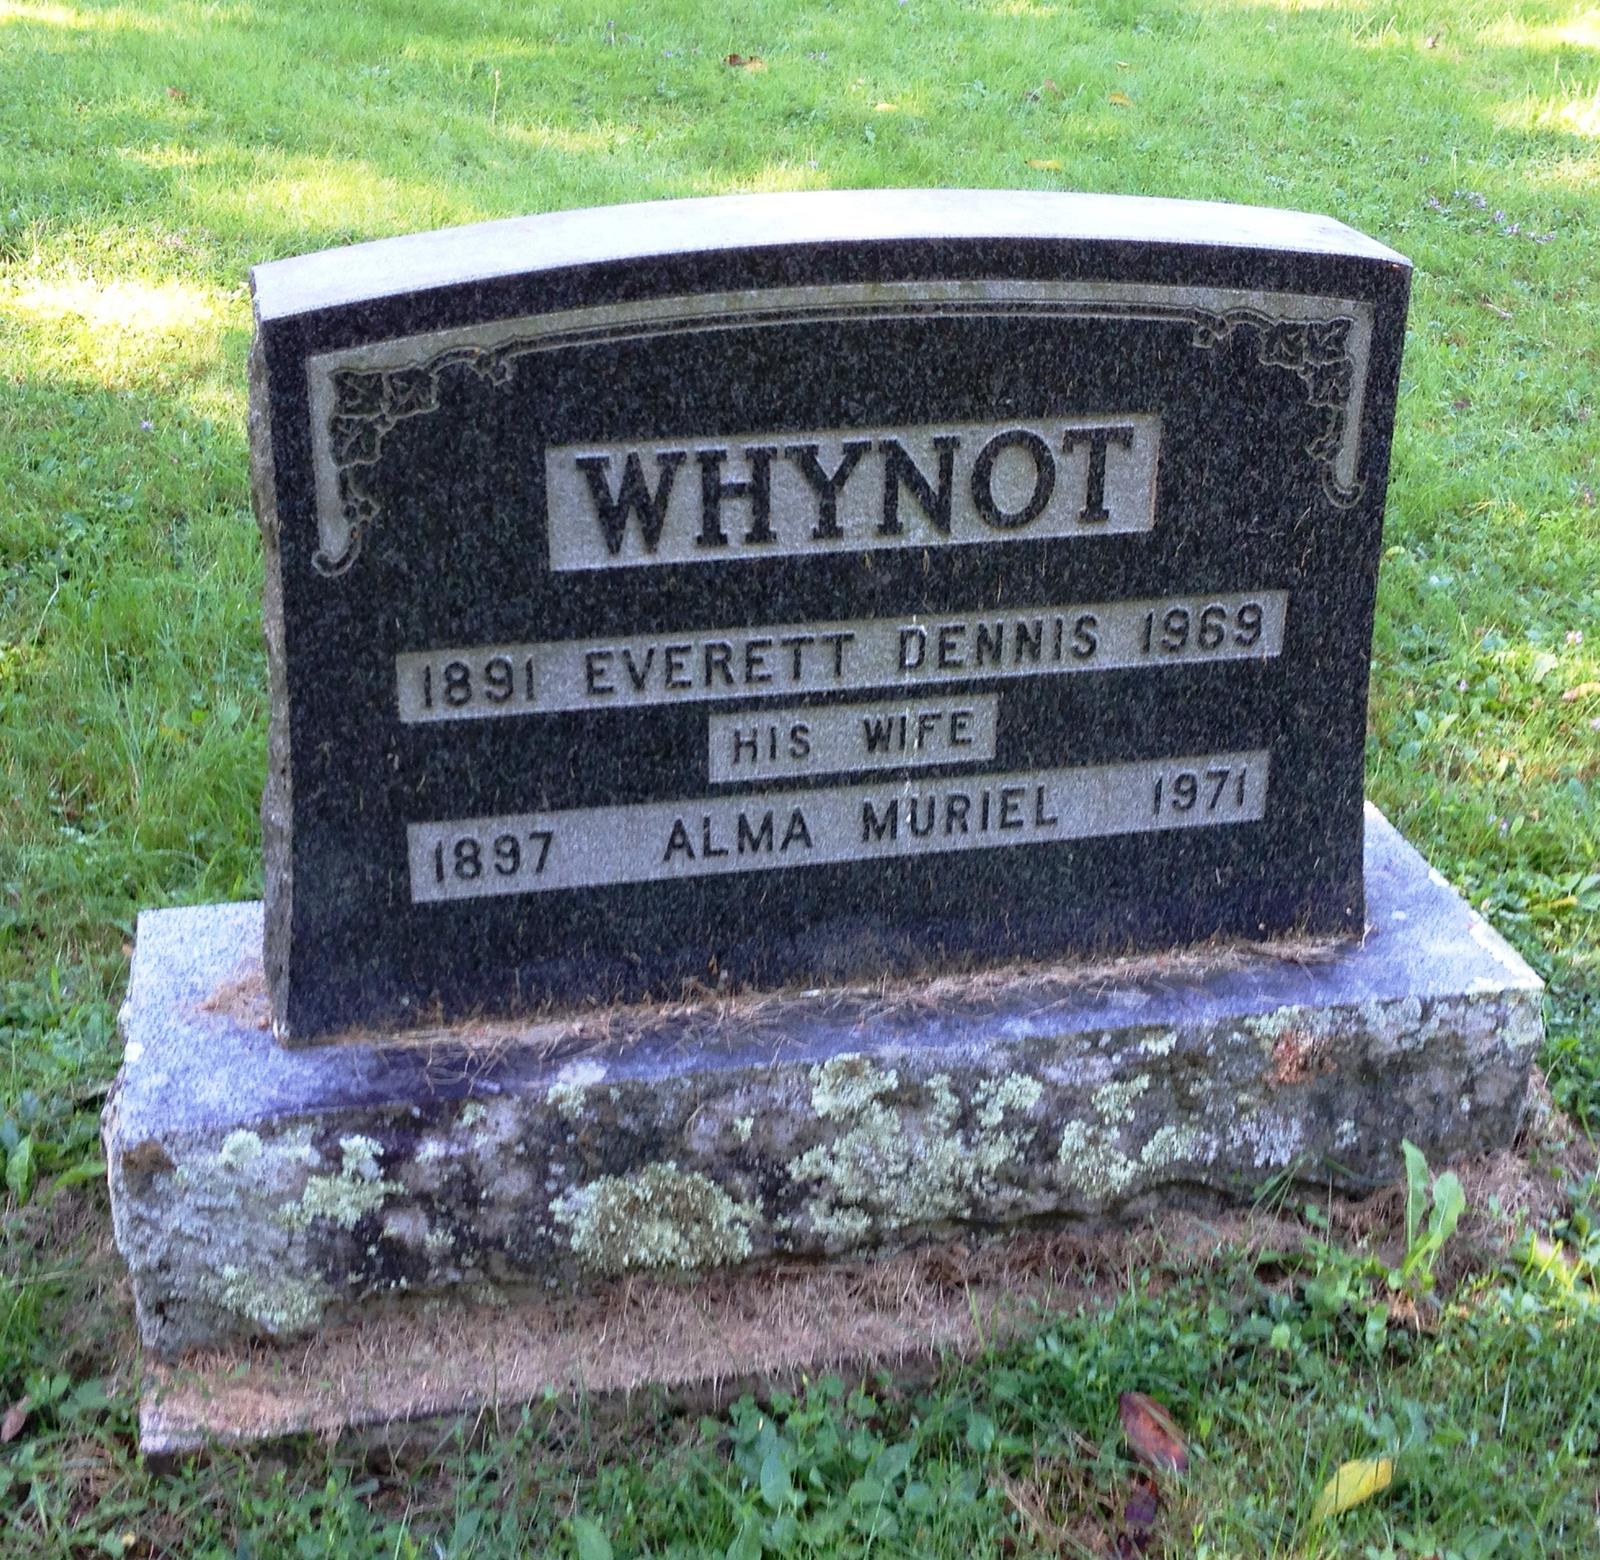 Alma Muriel Fotos alma muriel fancey whynot (1897-1971) - find a grave memorial